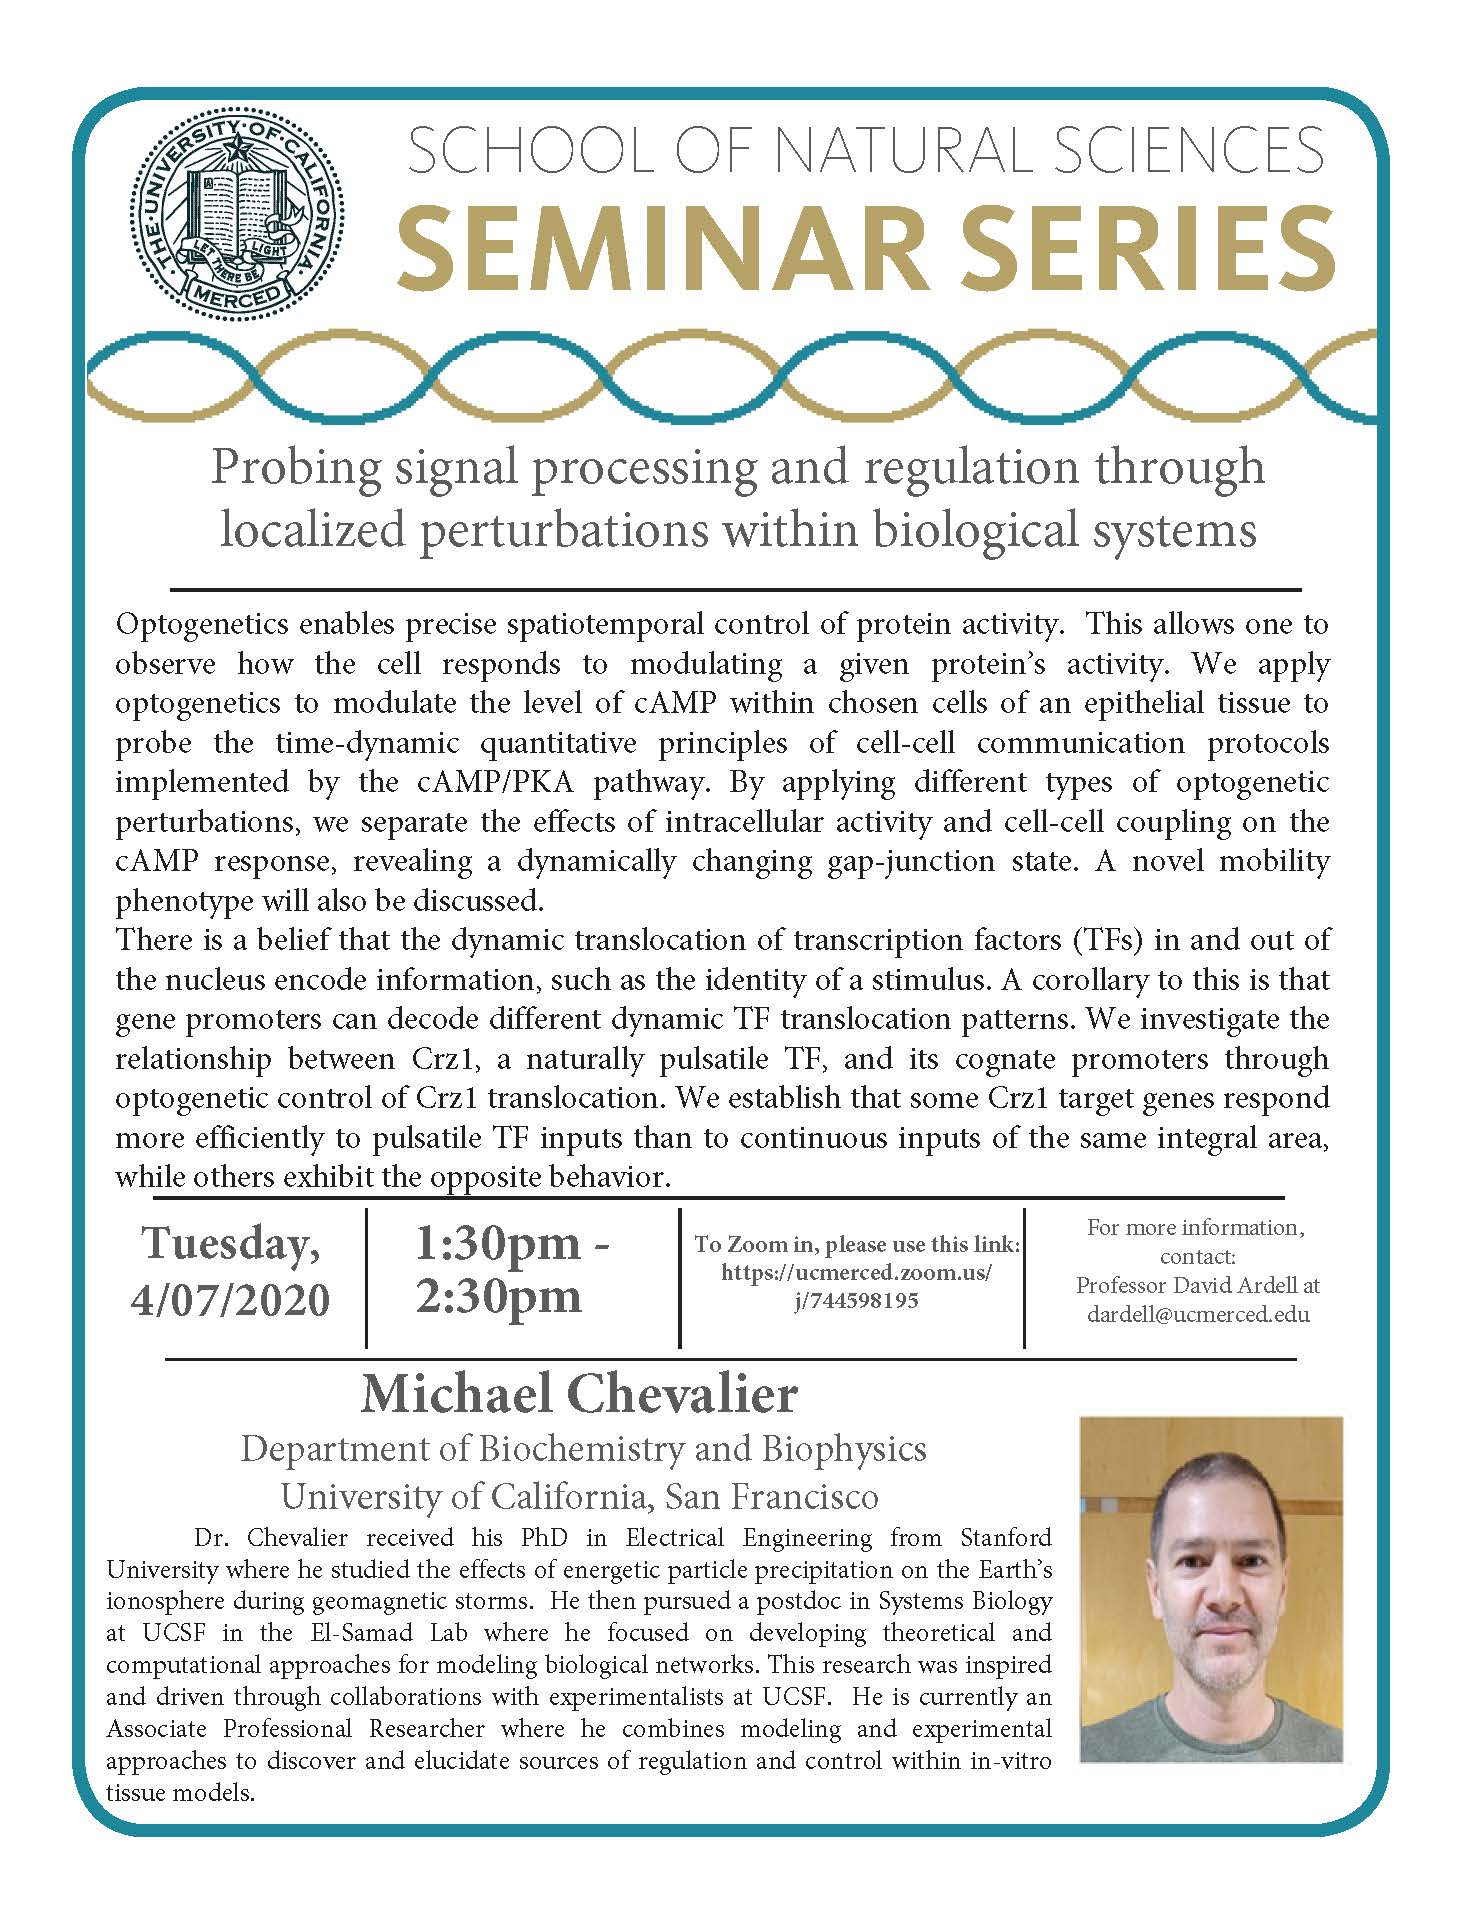 MCB Seminar for Dr. Michael Chevalier